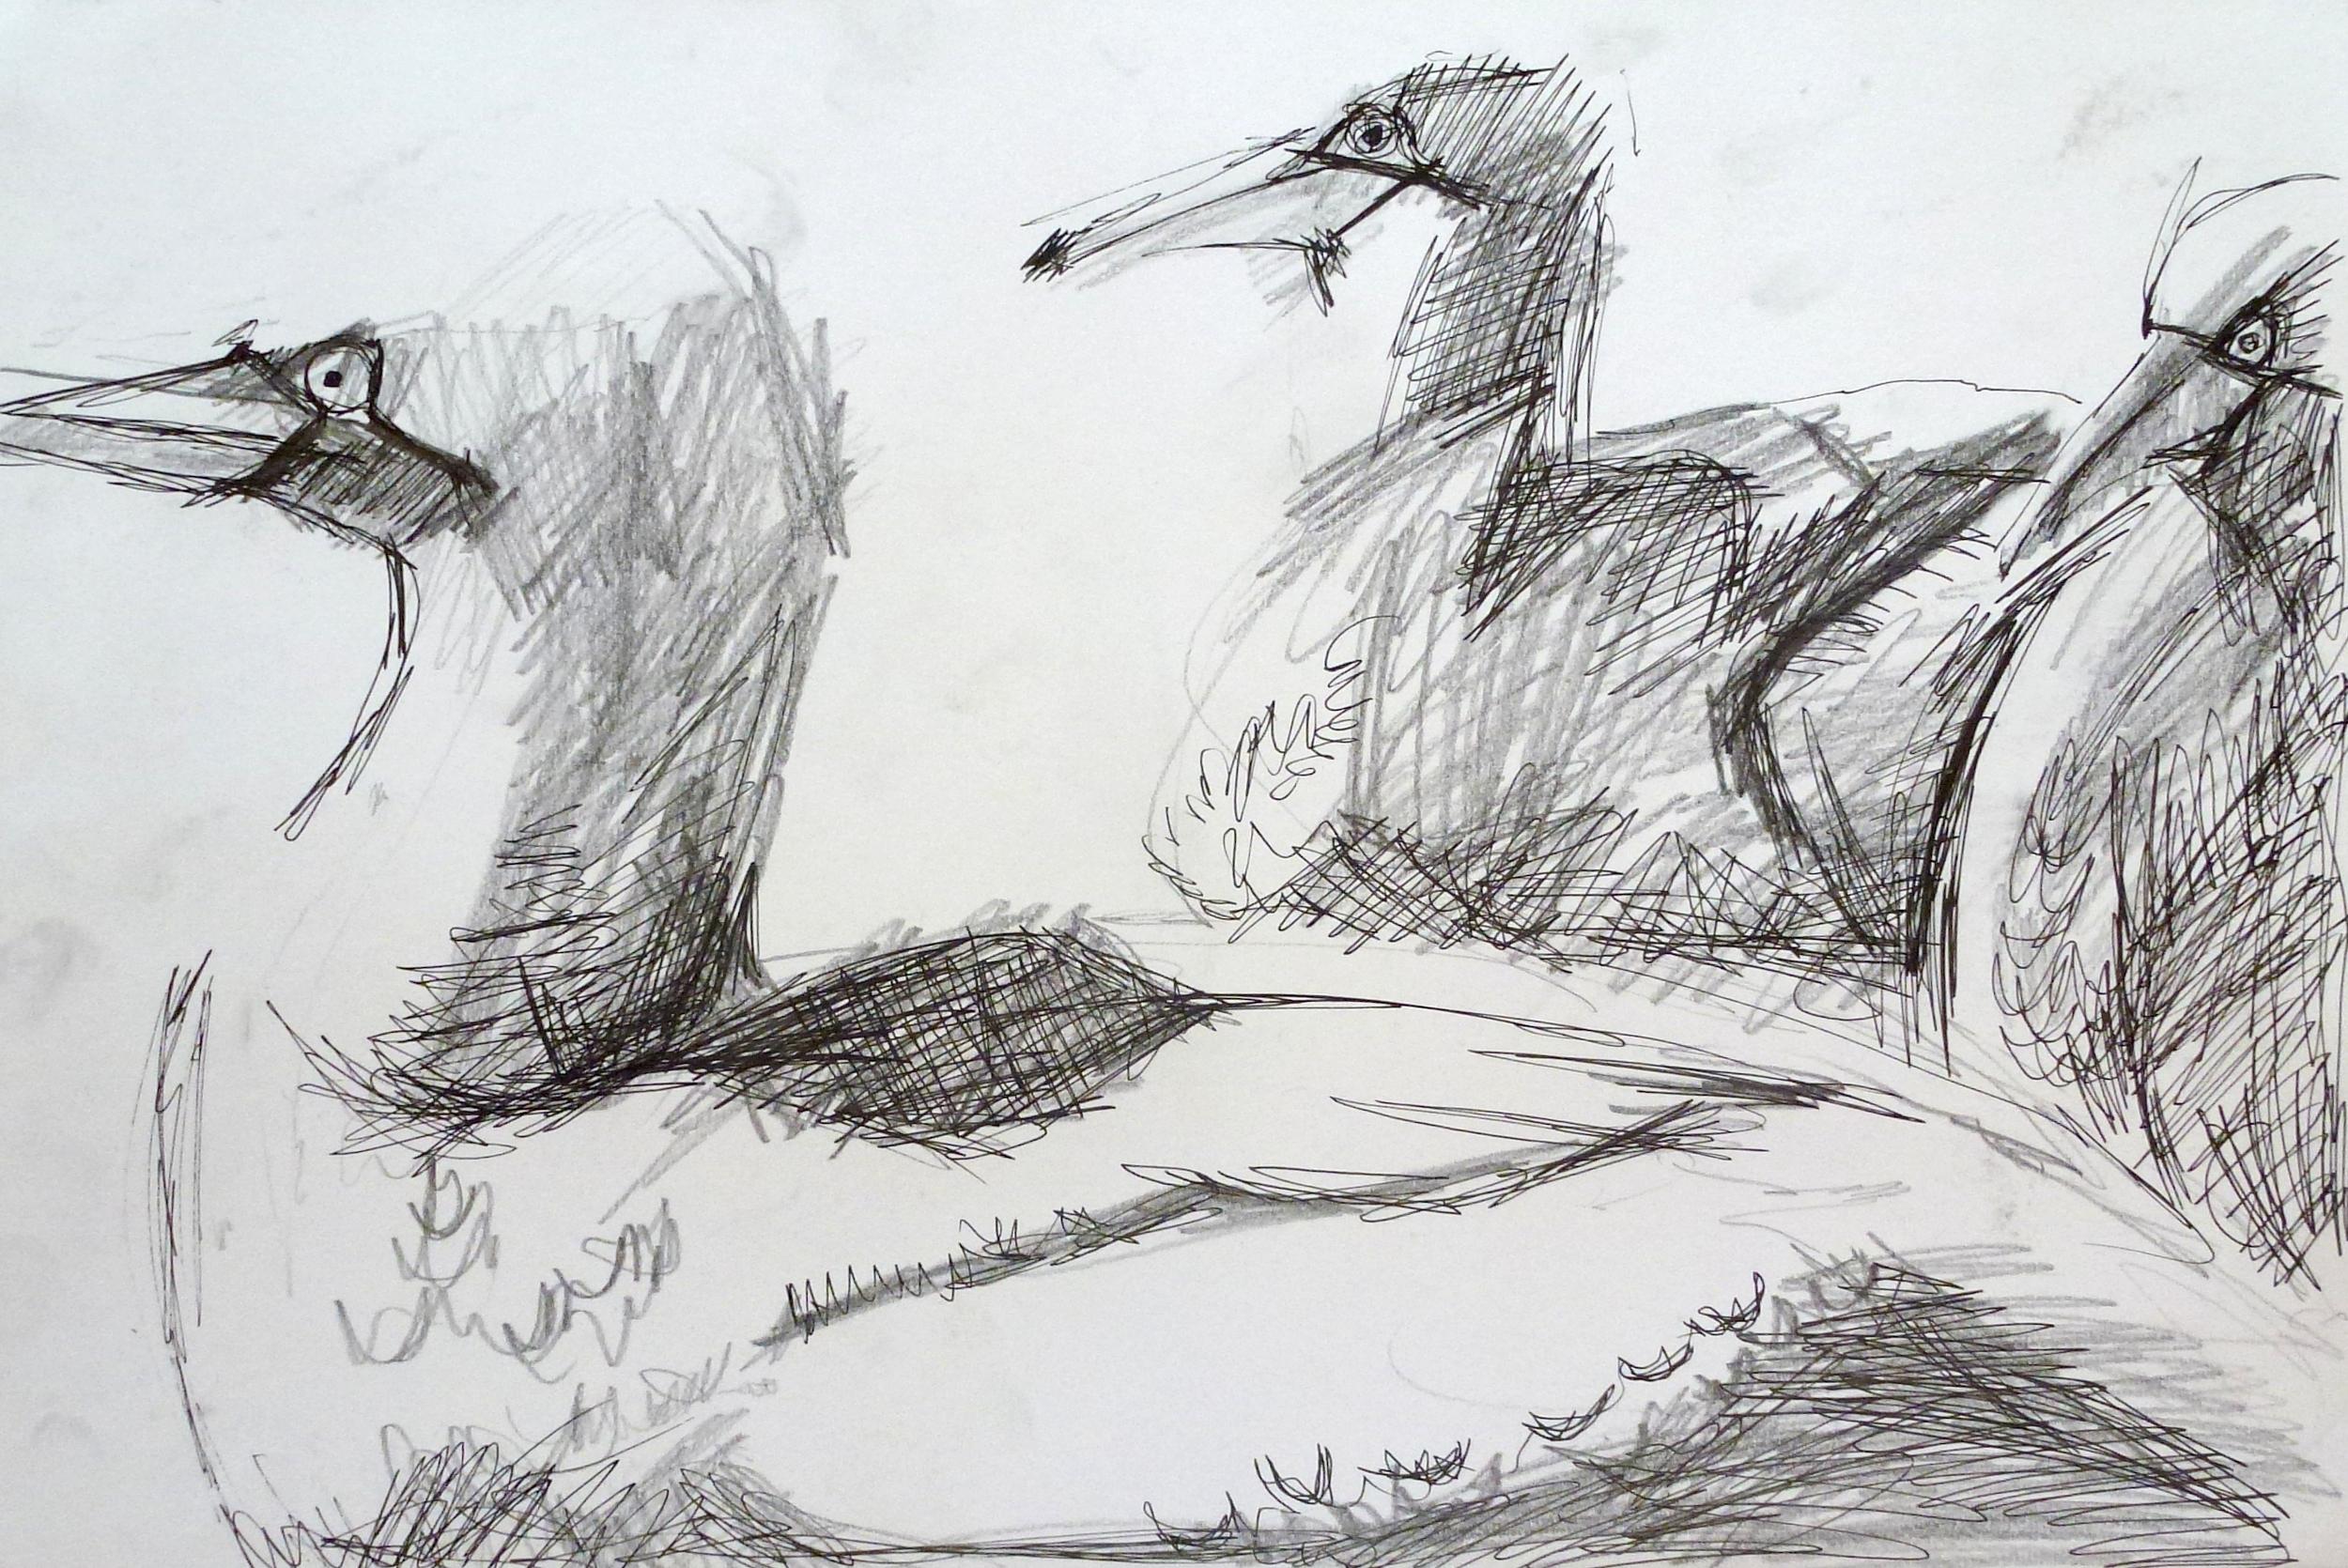 gannet sketch 2.JPG